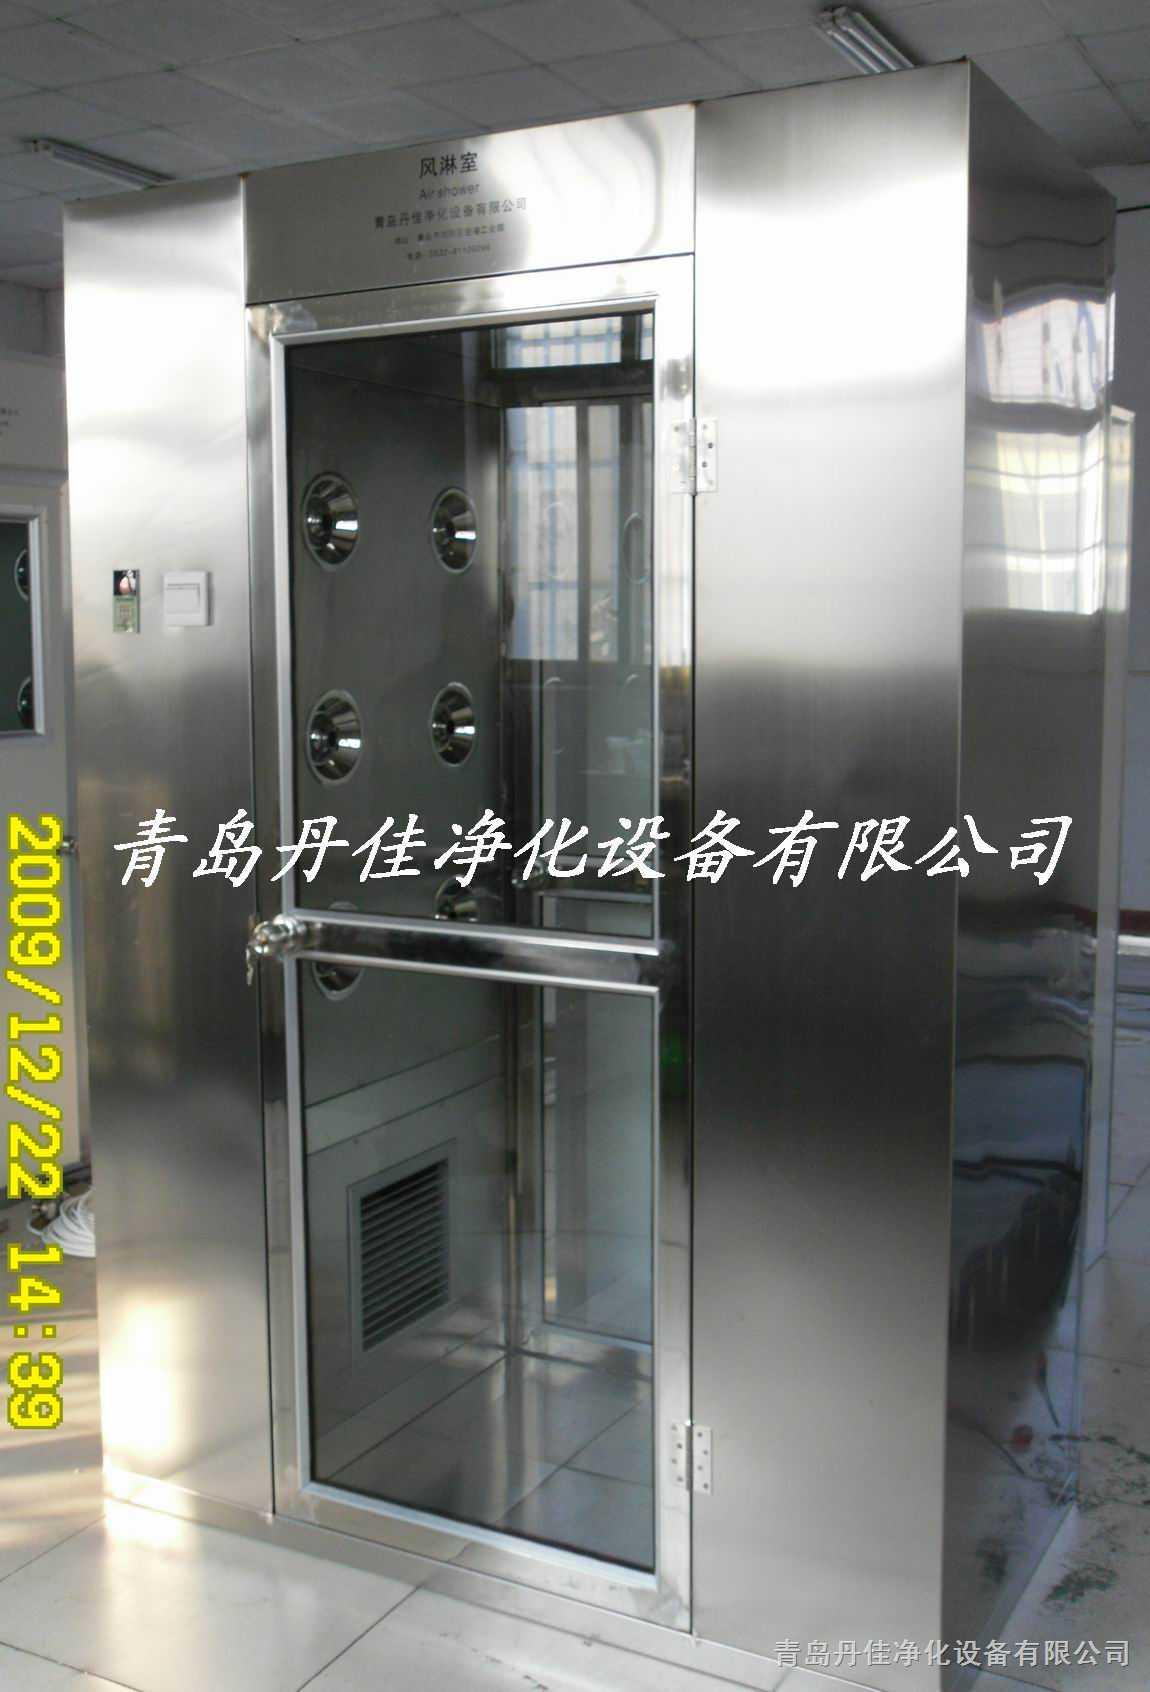 dj-1f山东青岛不锈钢风淋室